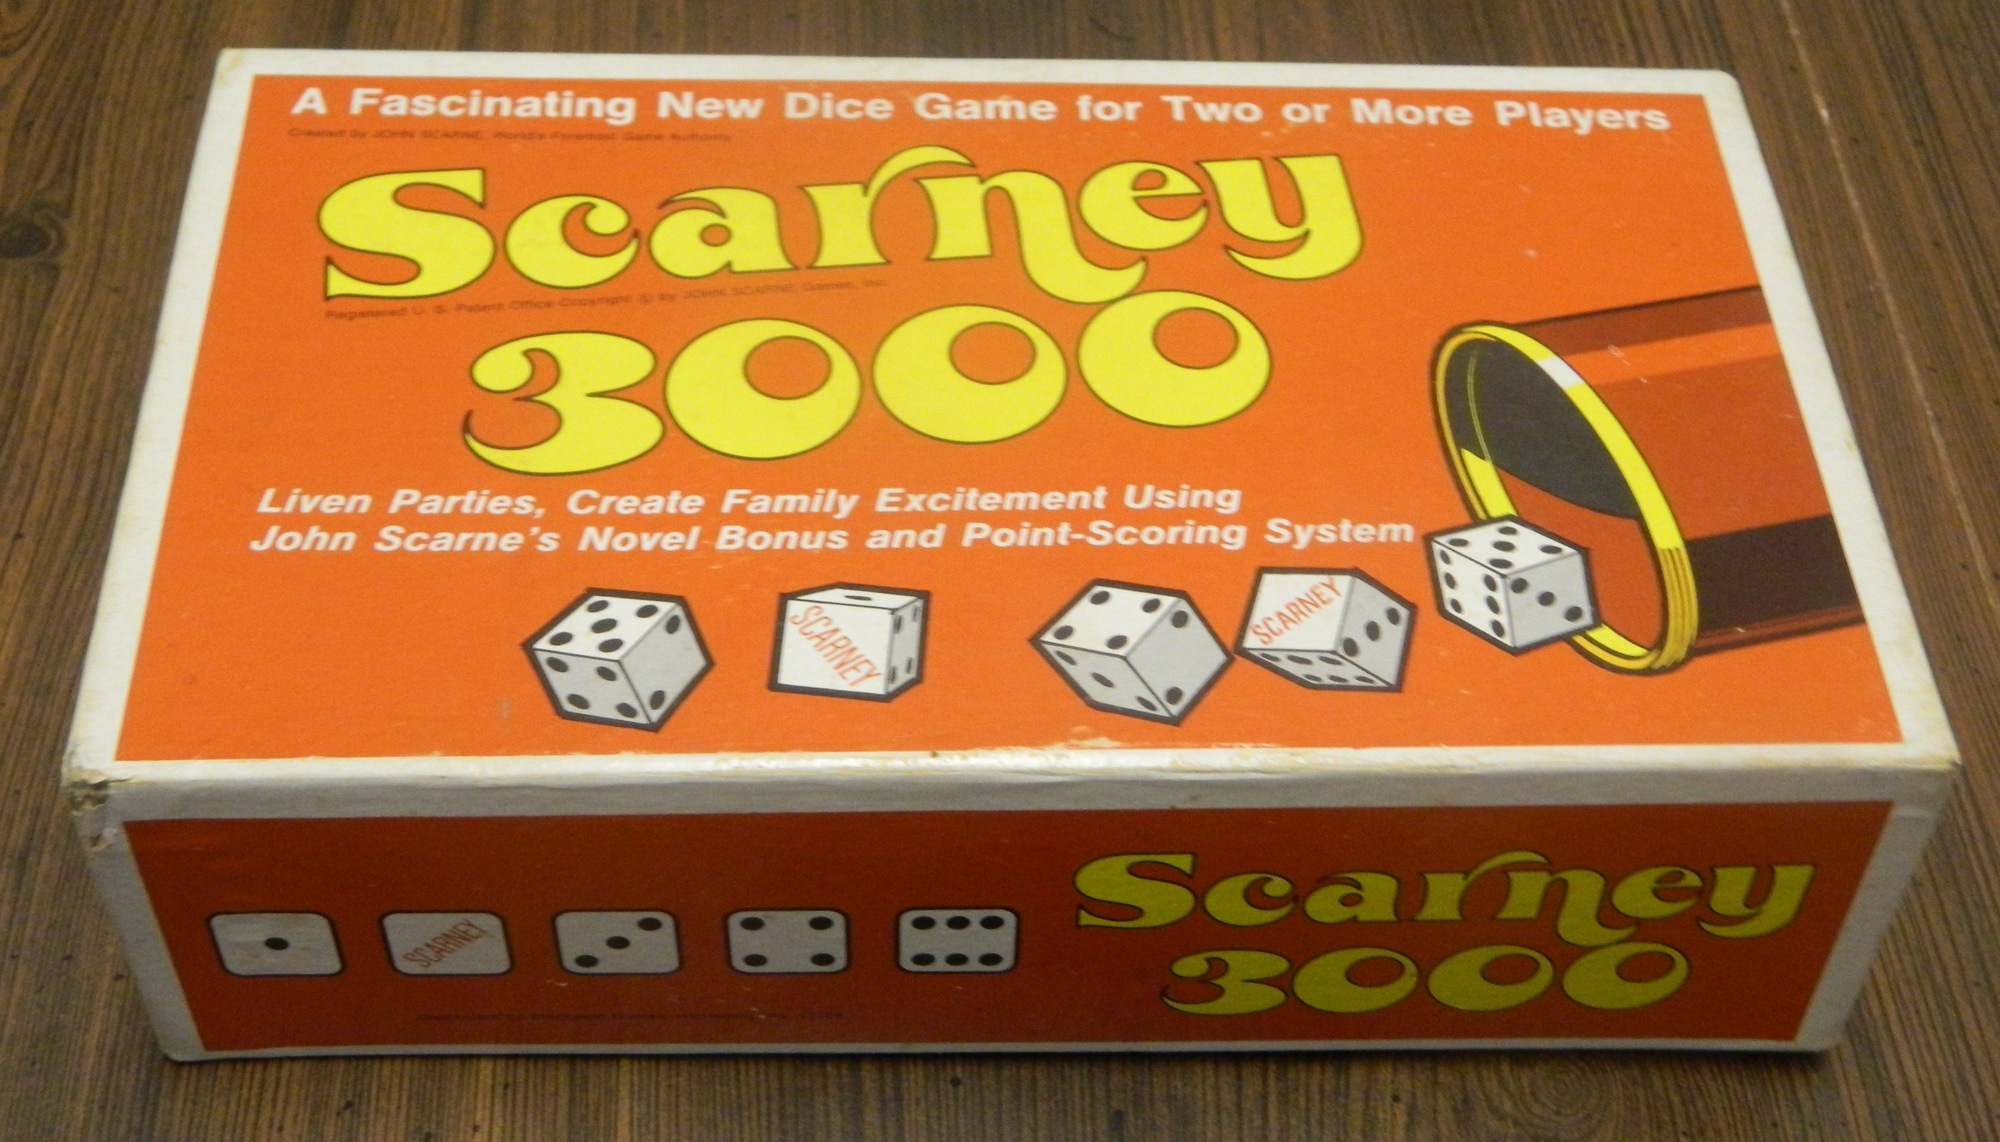 Scarney 3000 Box